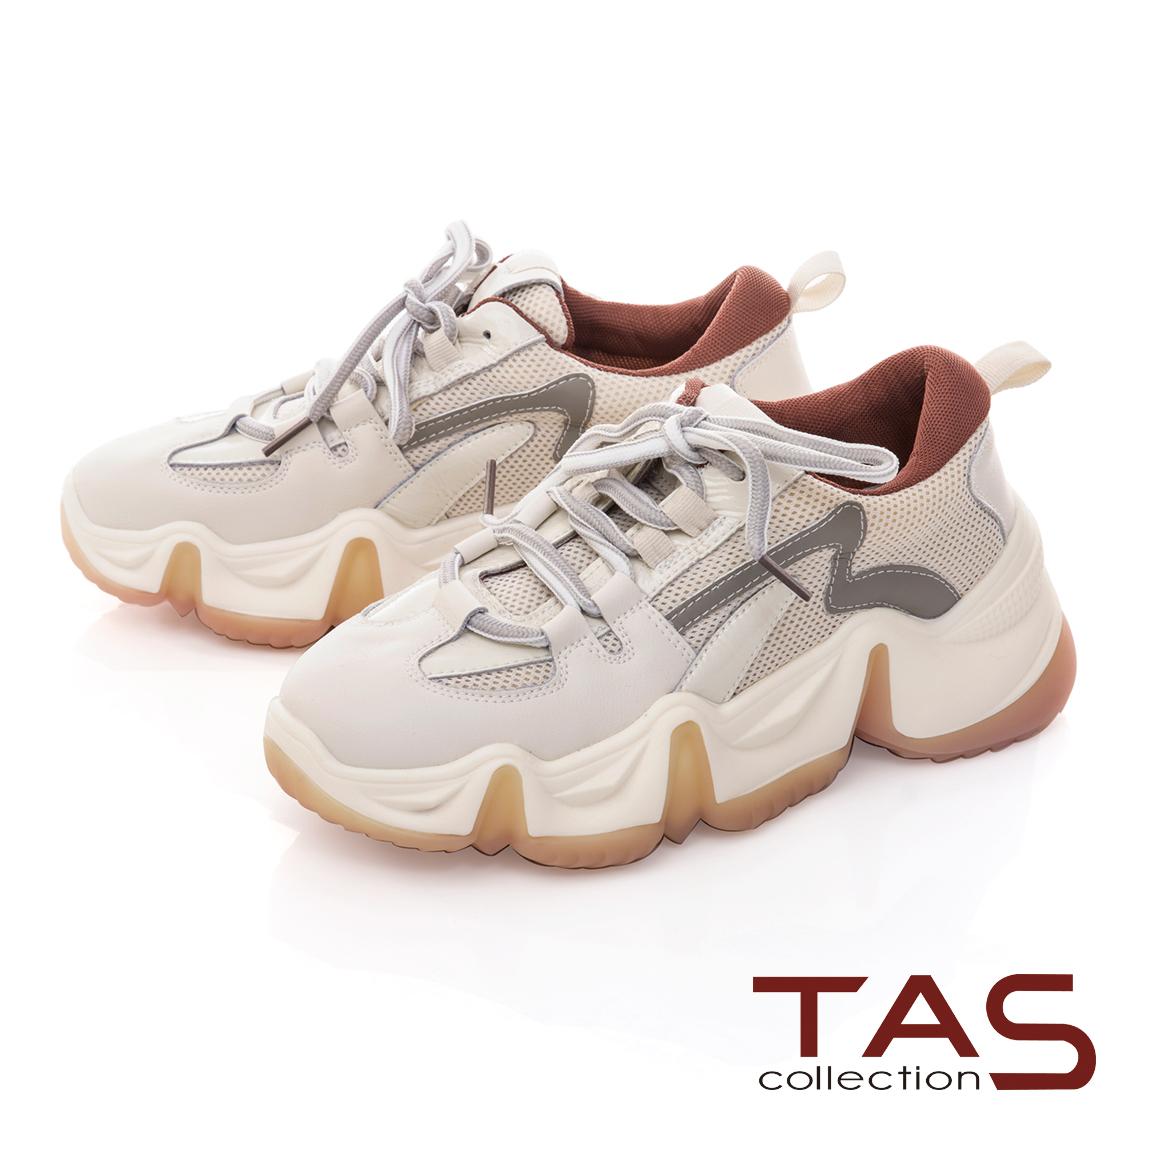 TAS流線造型牛皮綁帶老爹鞋-乾燥粉